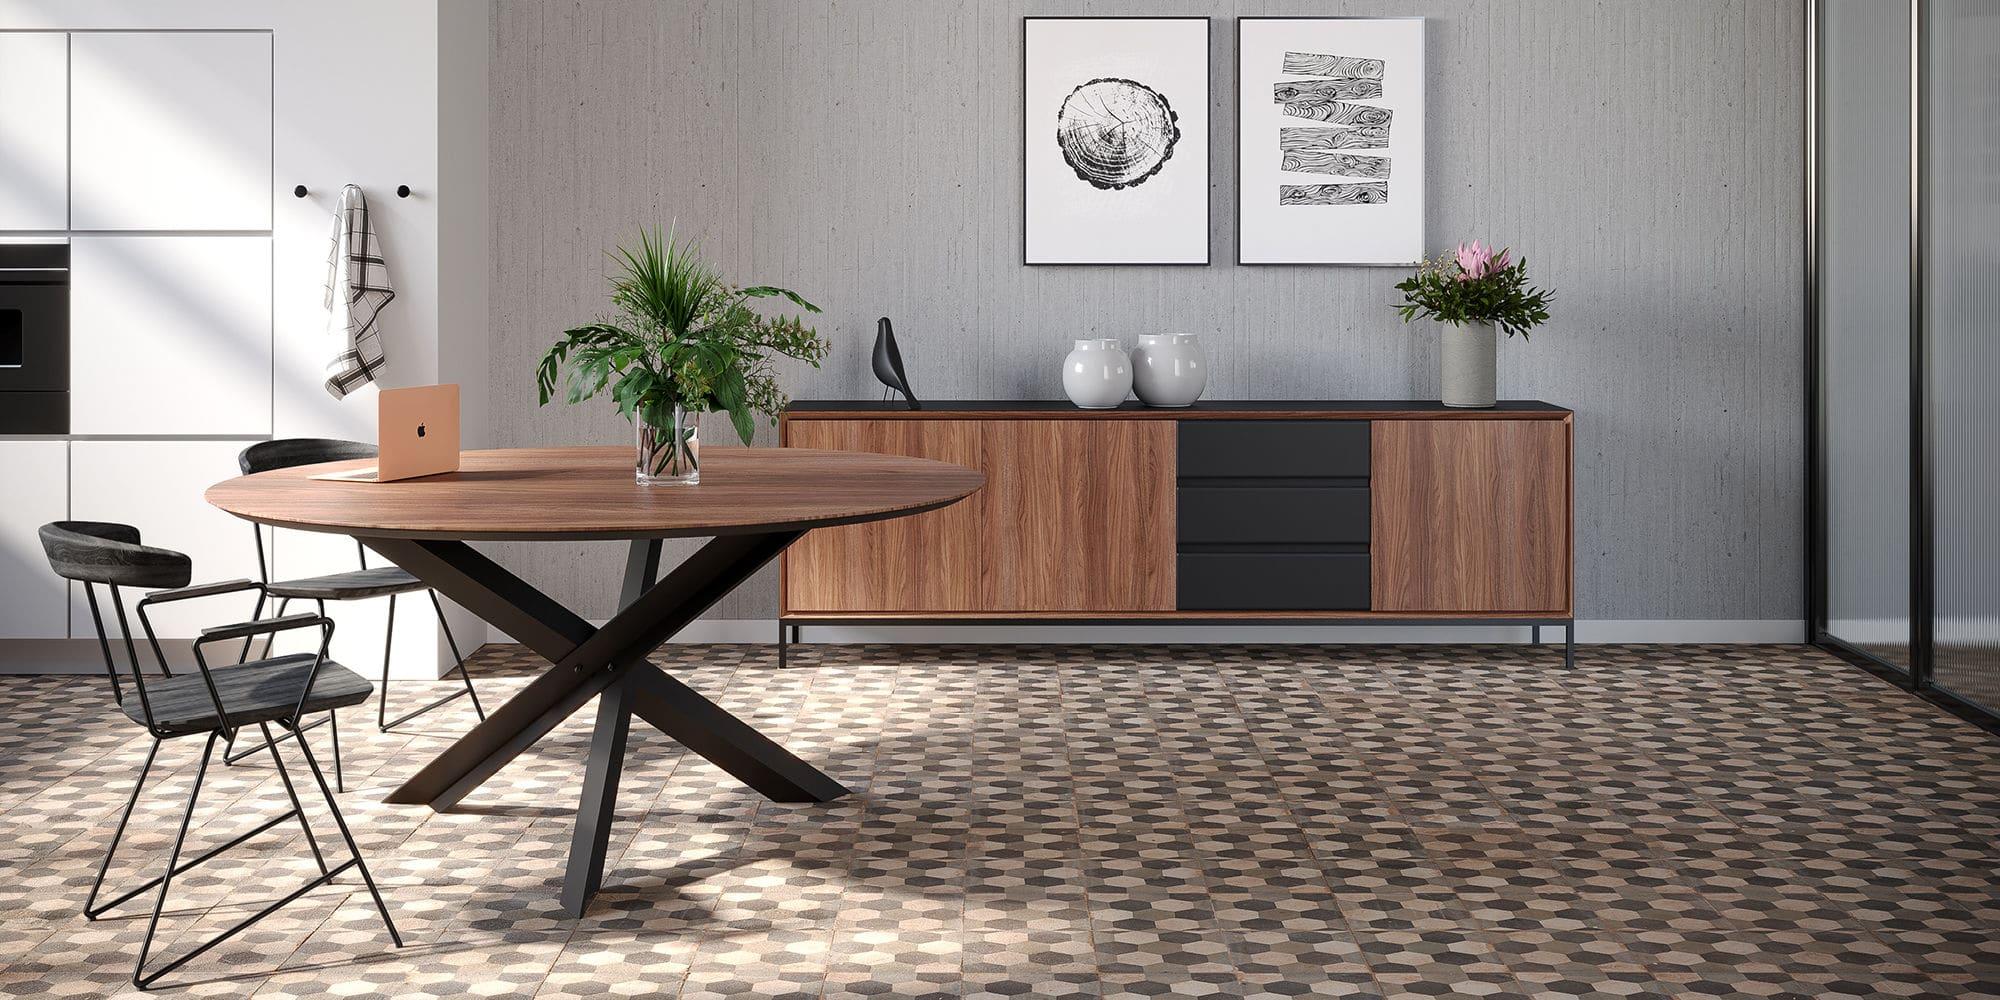 Table ronde en chêne, noyer et métal